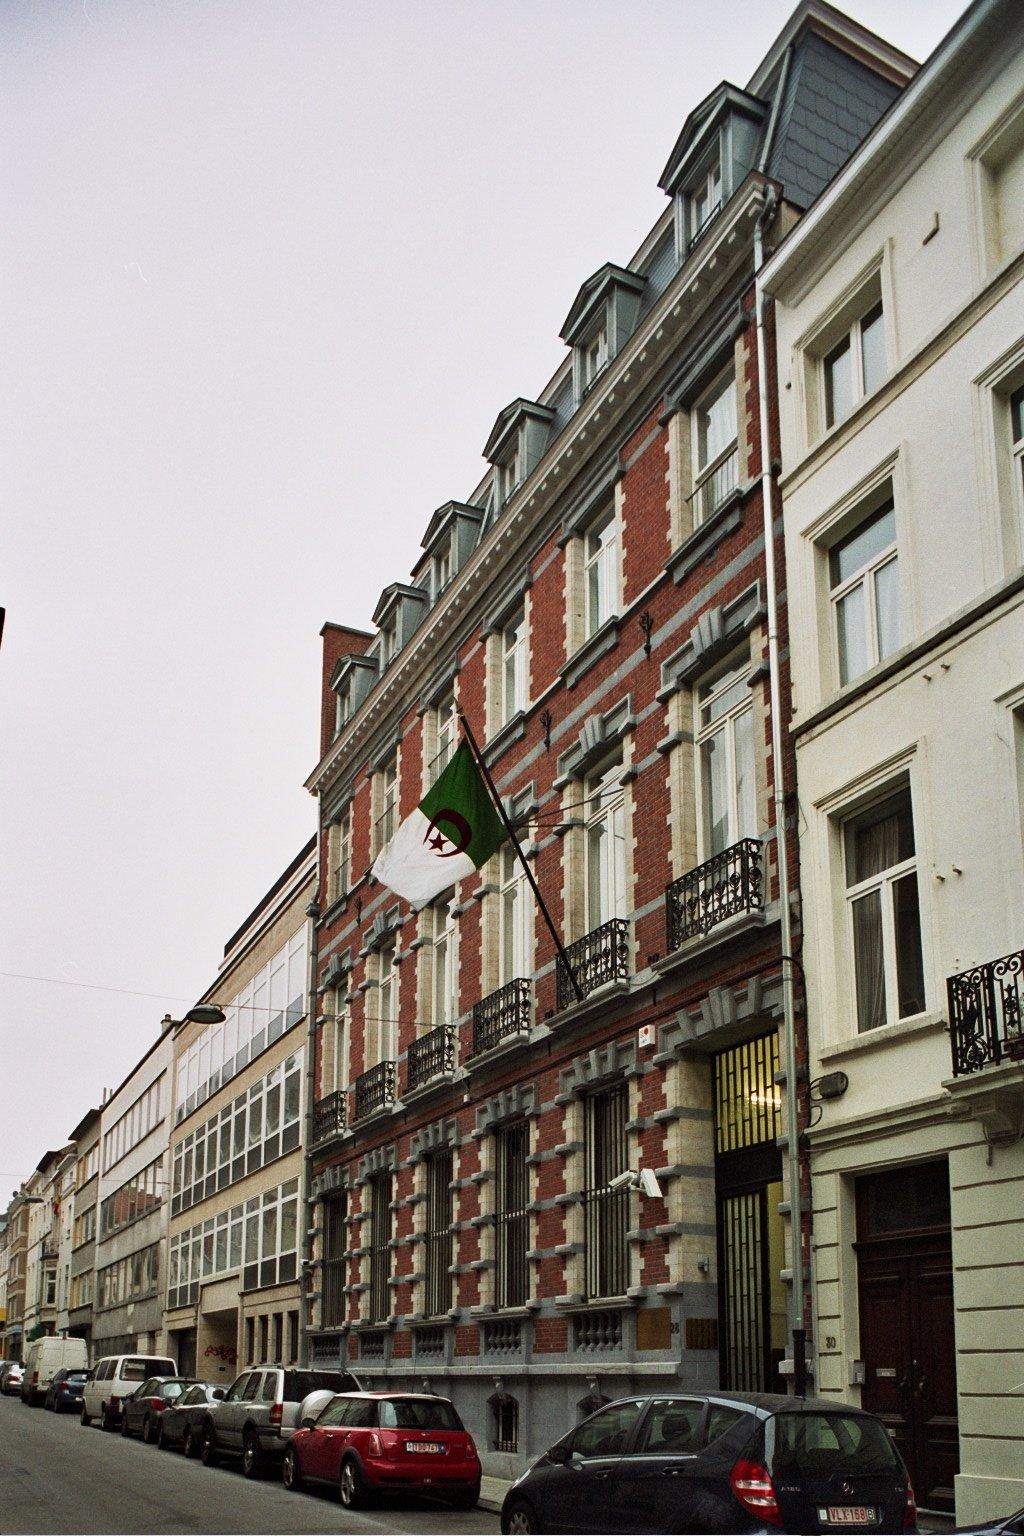 Rue d'Edimbourg 26-28., 2008